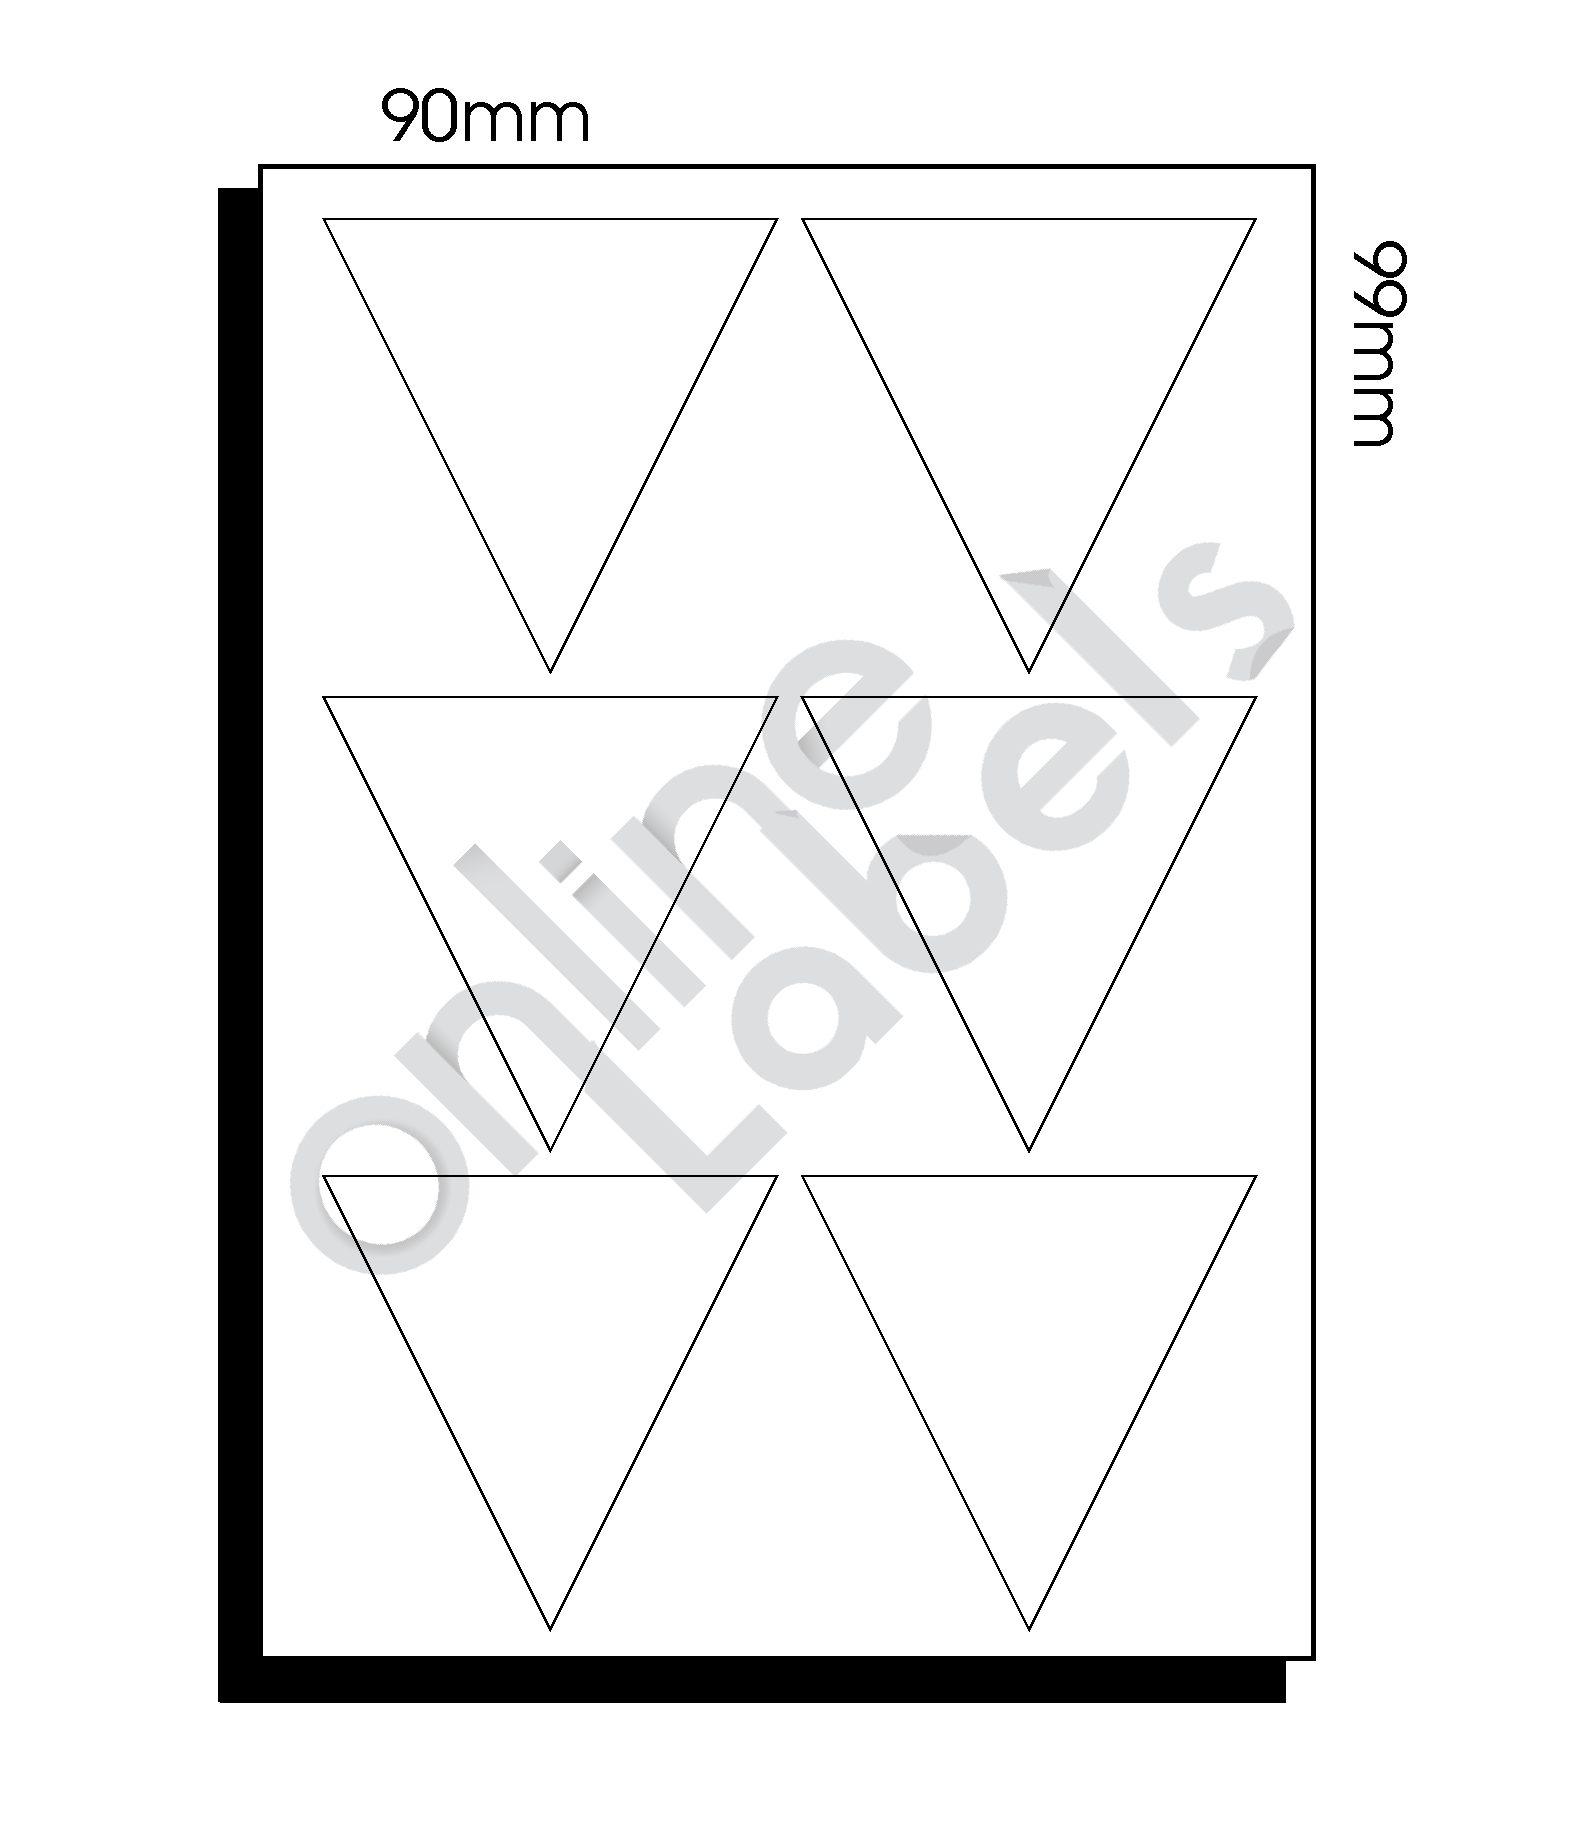 90mm x 99mm x 99mm (085) – 6 Labels per Sheet